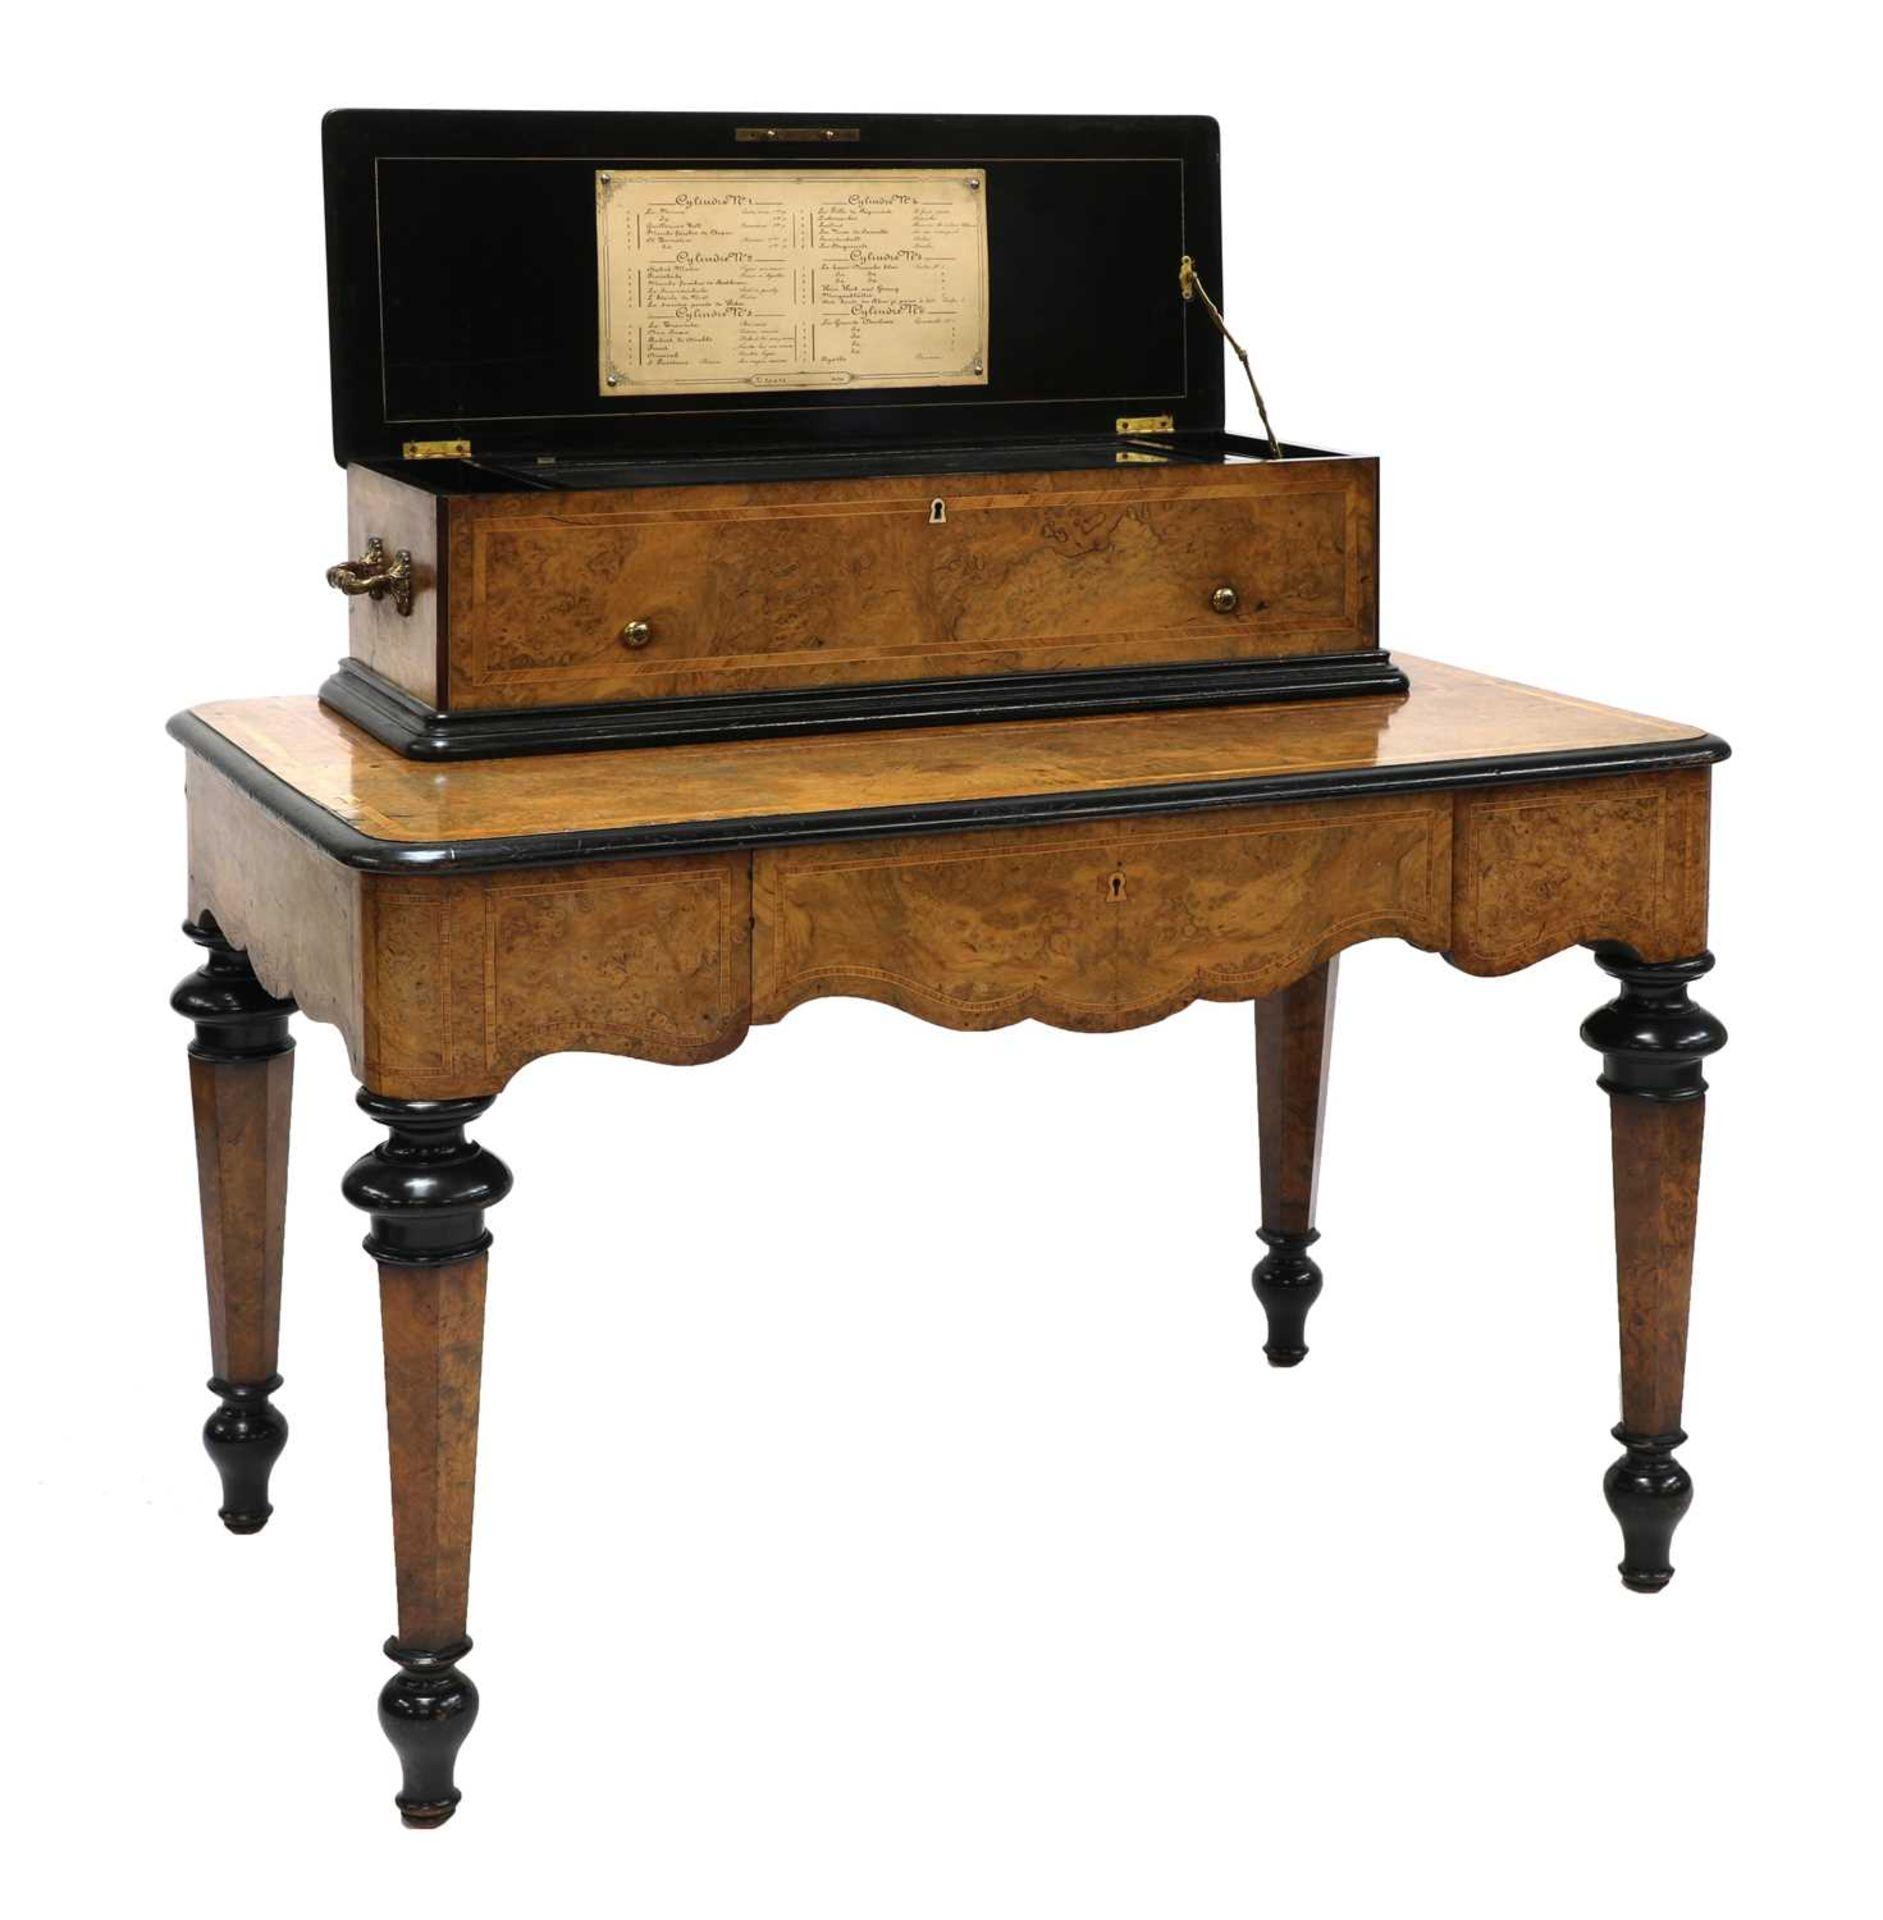 A Swiss interchangeable cylinder musical box,